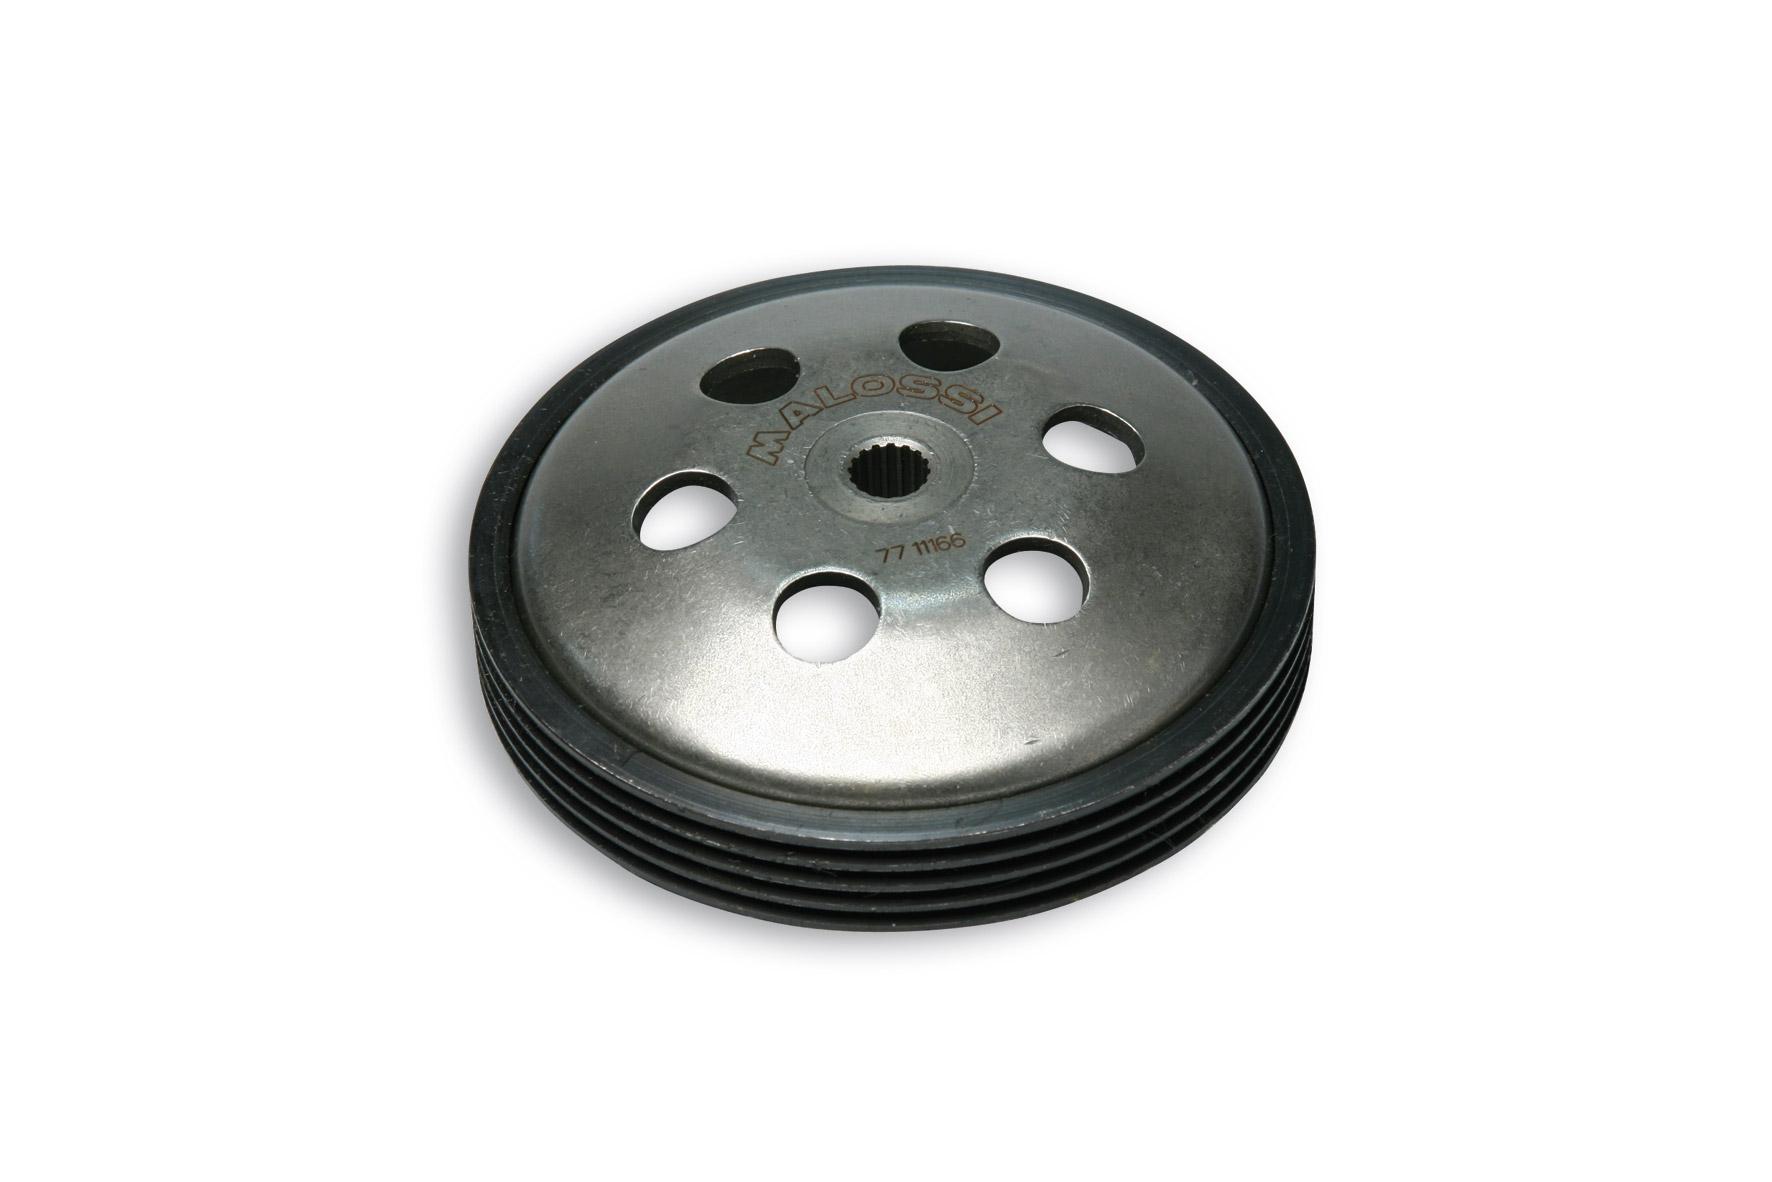 Campana frizione alettata WING CLUTCH BELL Ø interno 107 mm per motori Yamaha - Minarelli